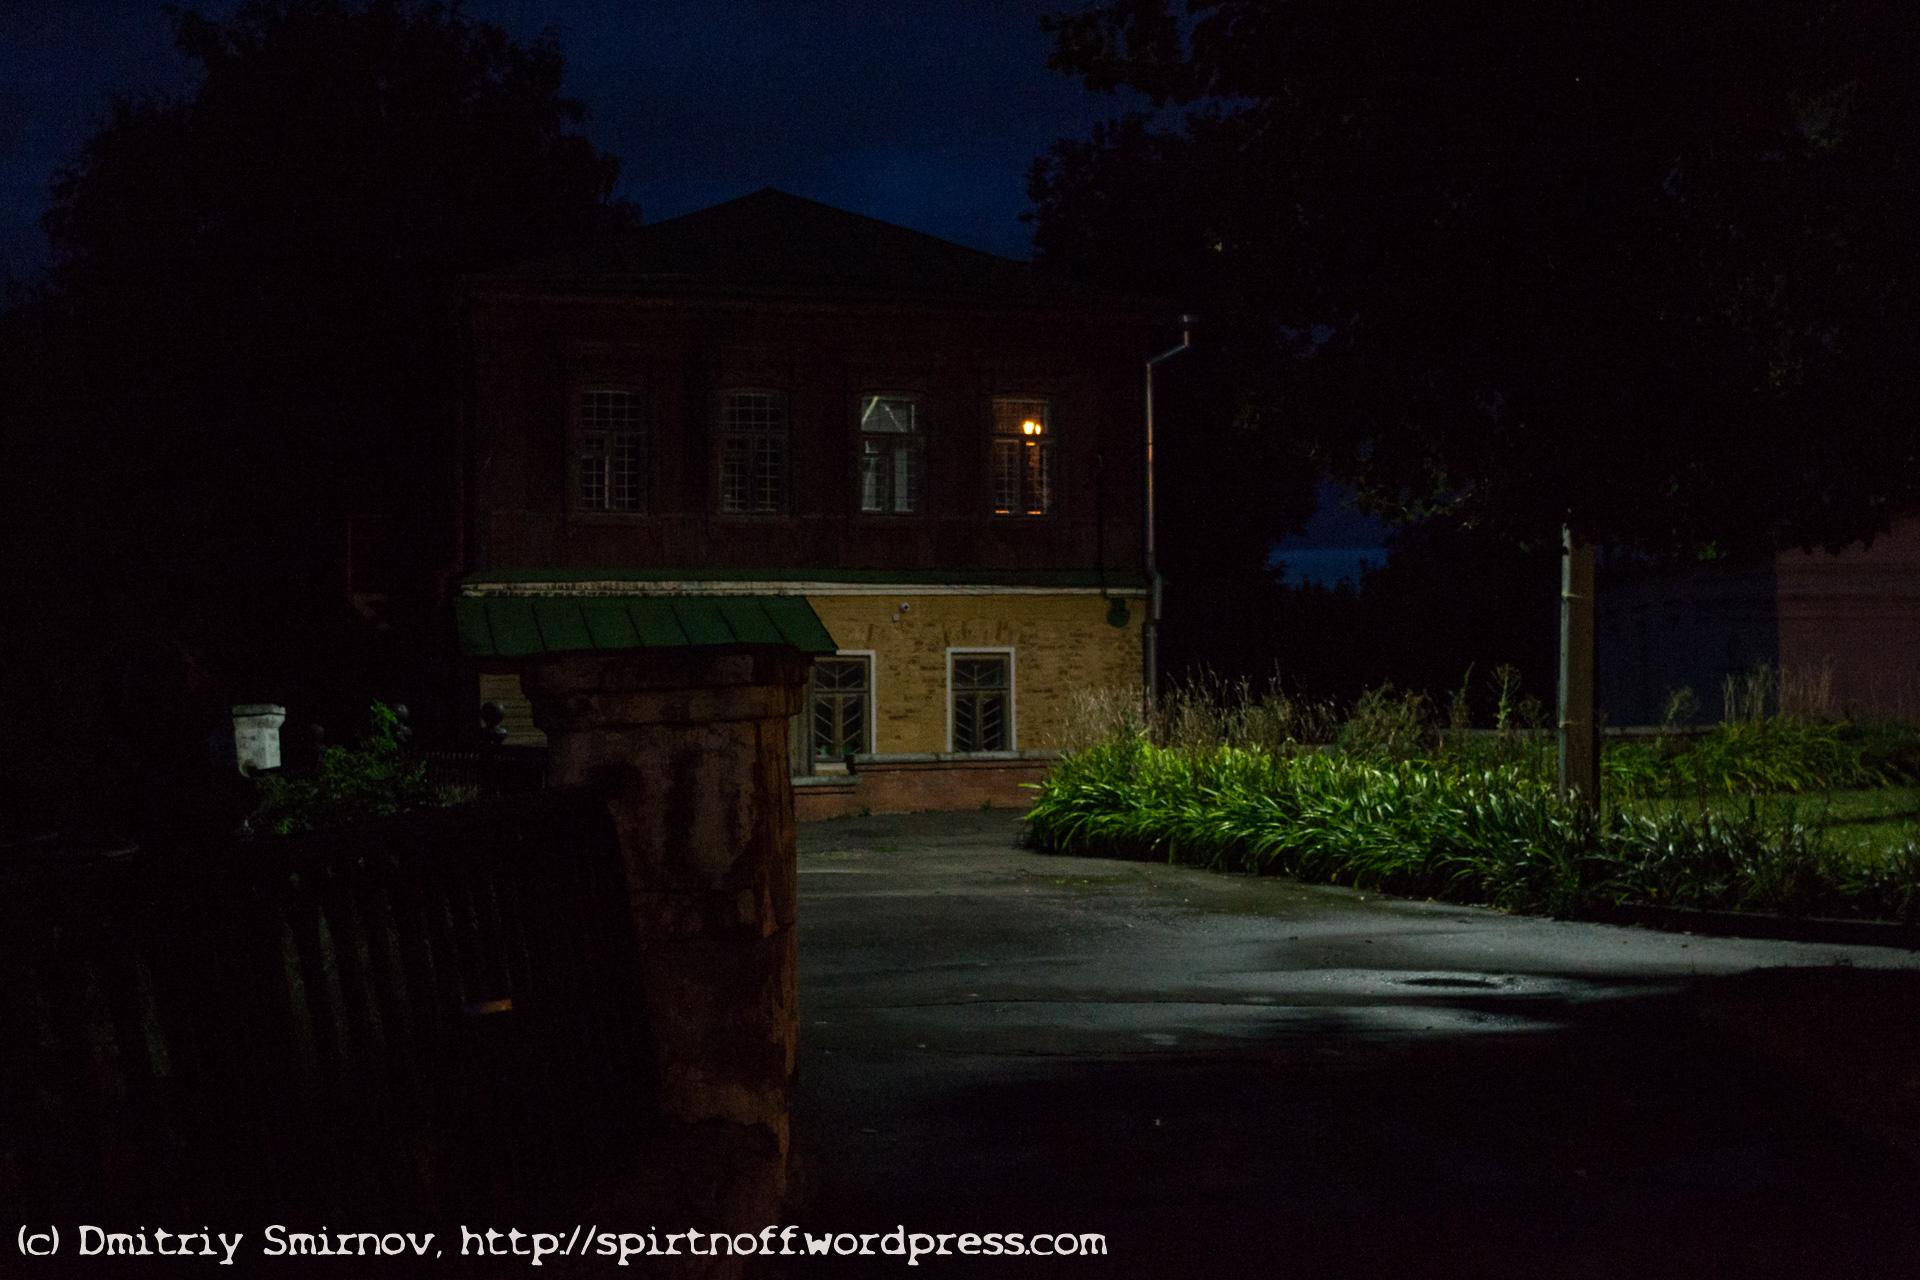 blog-26-of-59 Путешествия  Рязань. Город темных фонарей